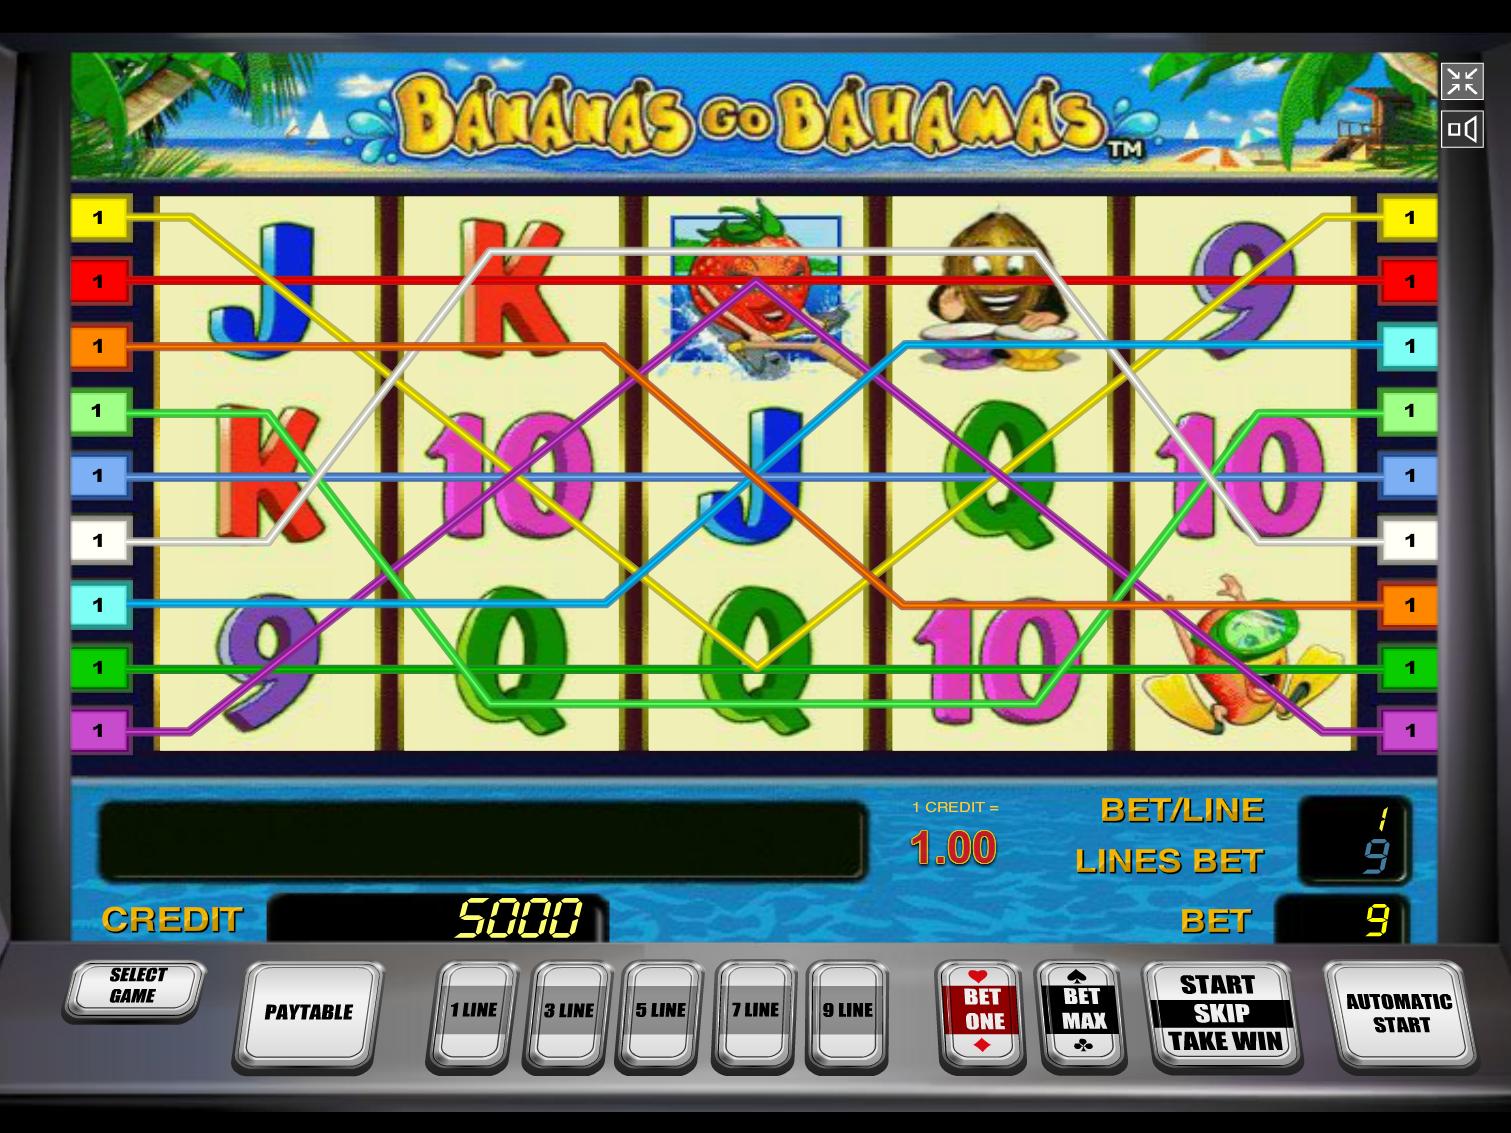 play Bananas Go Bahamas online